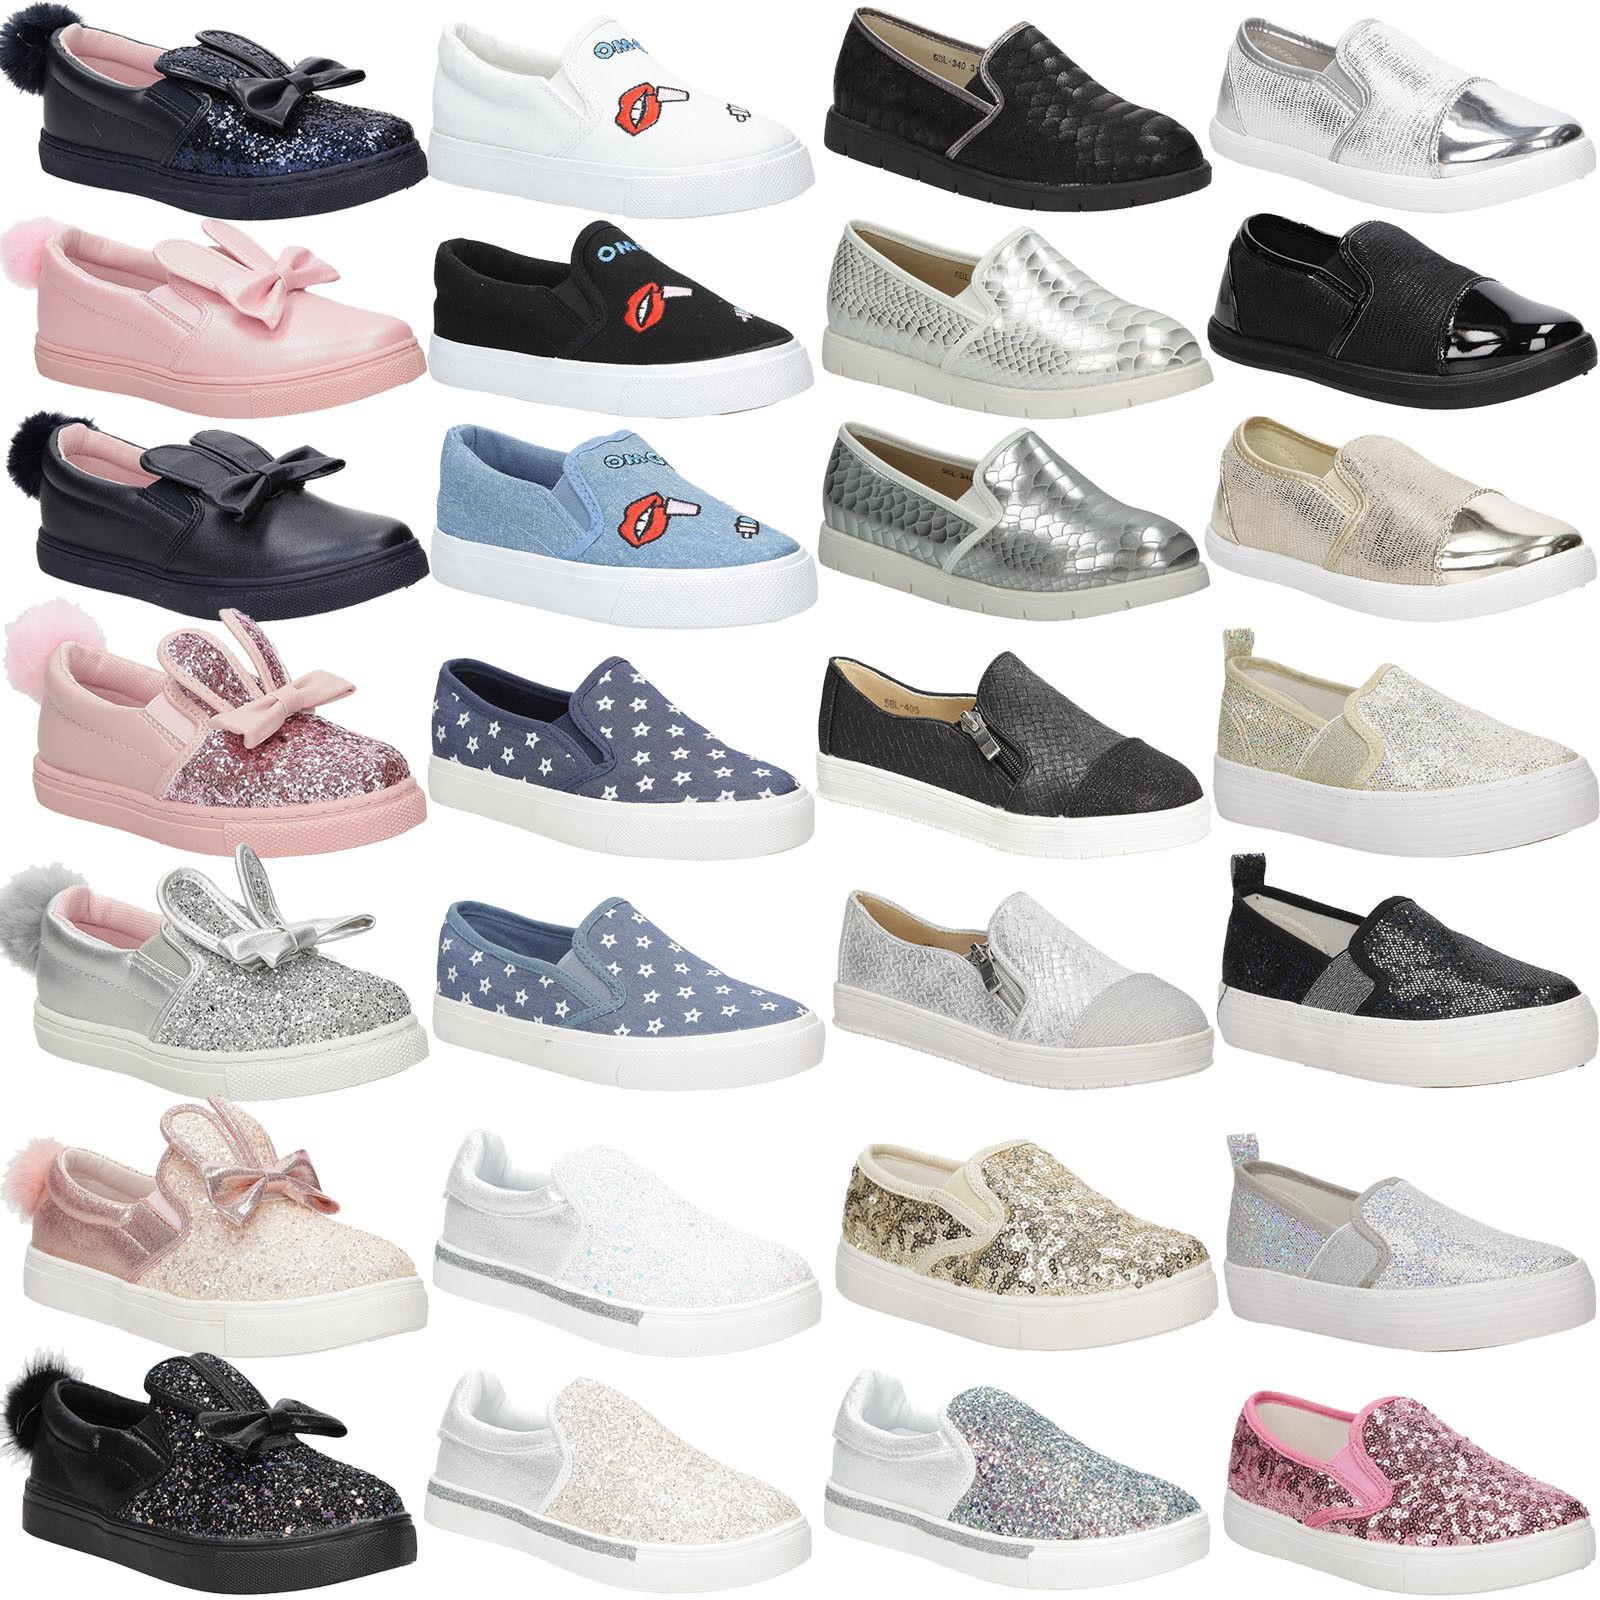 BRANDNEU DAMEN  zapatos   123704 HALB zapatos  zapatos SCHWARZ 36 4f2869